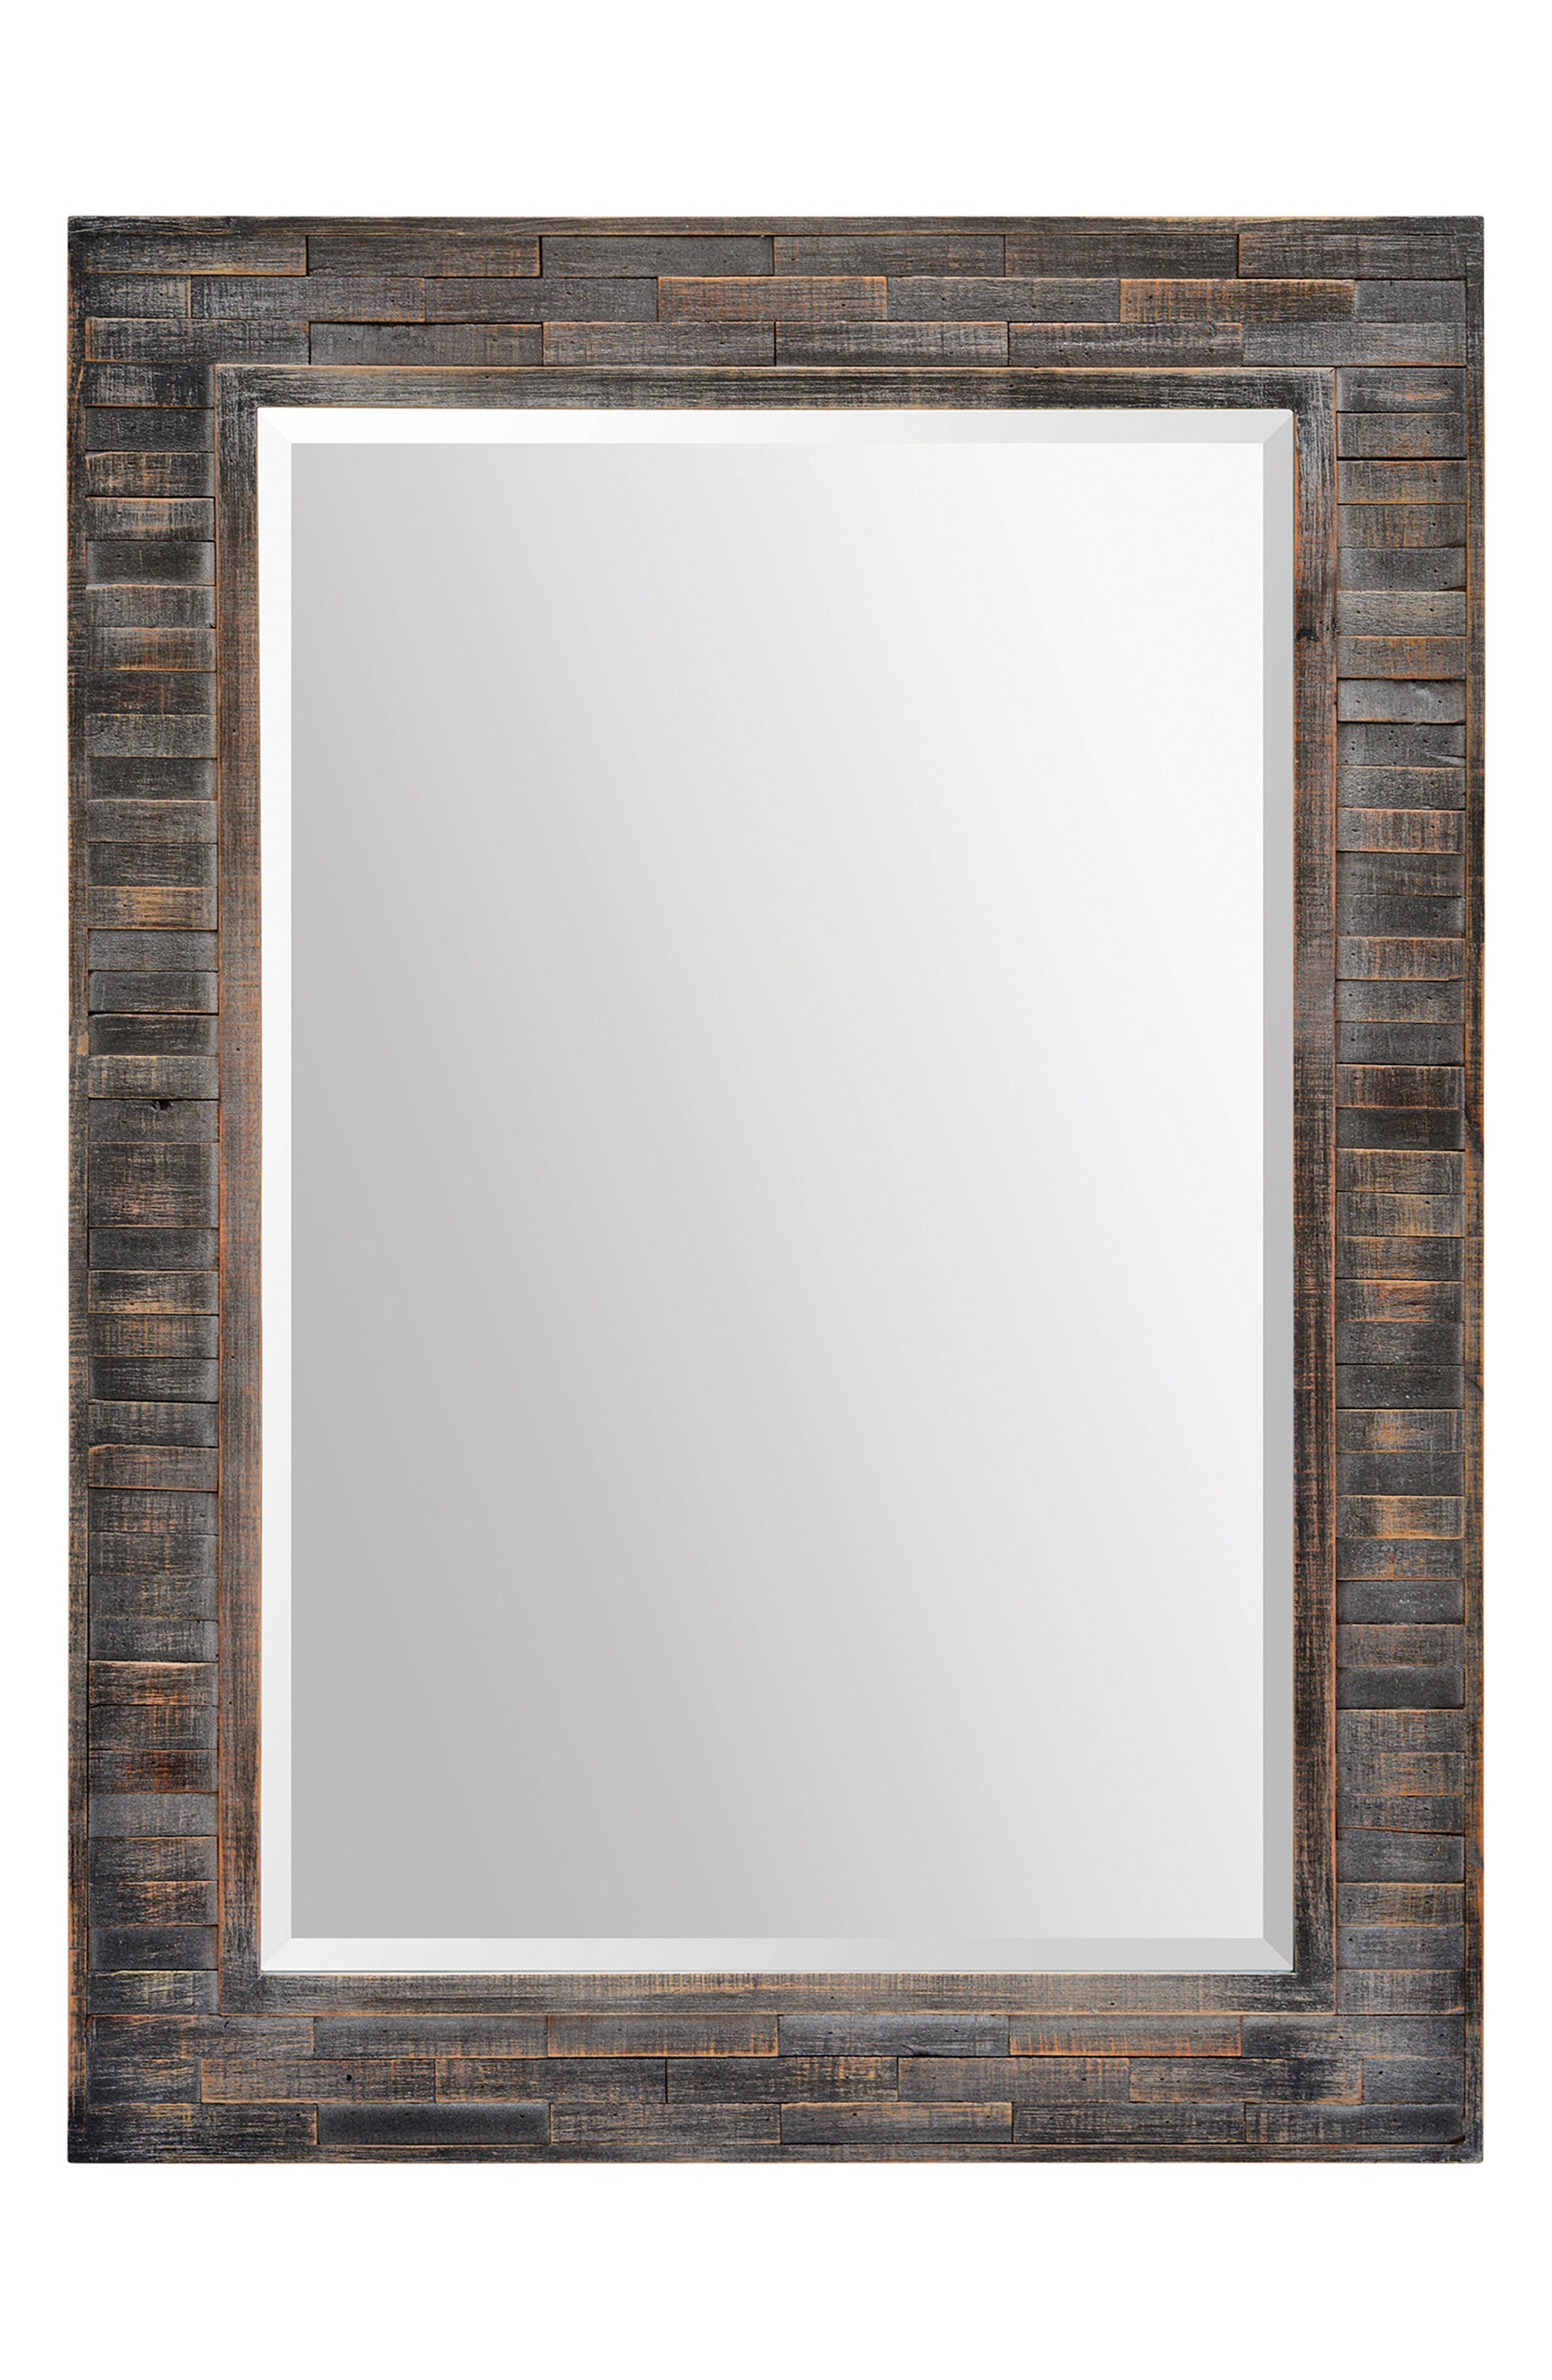 Mirrors Home Decor | Nordstrom